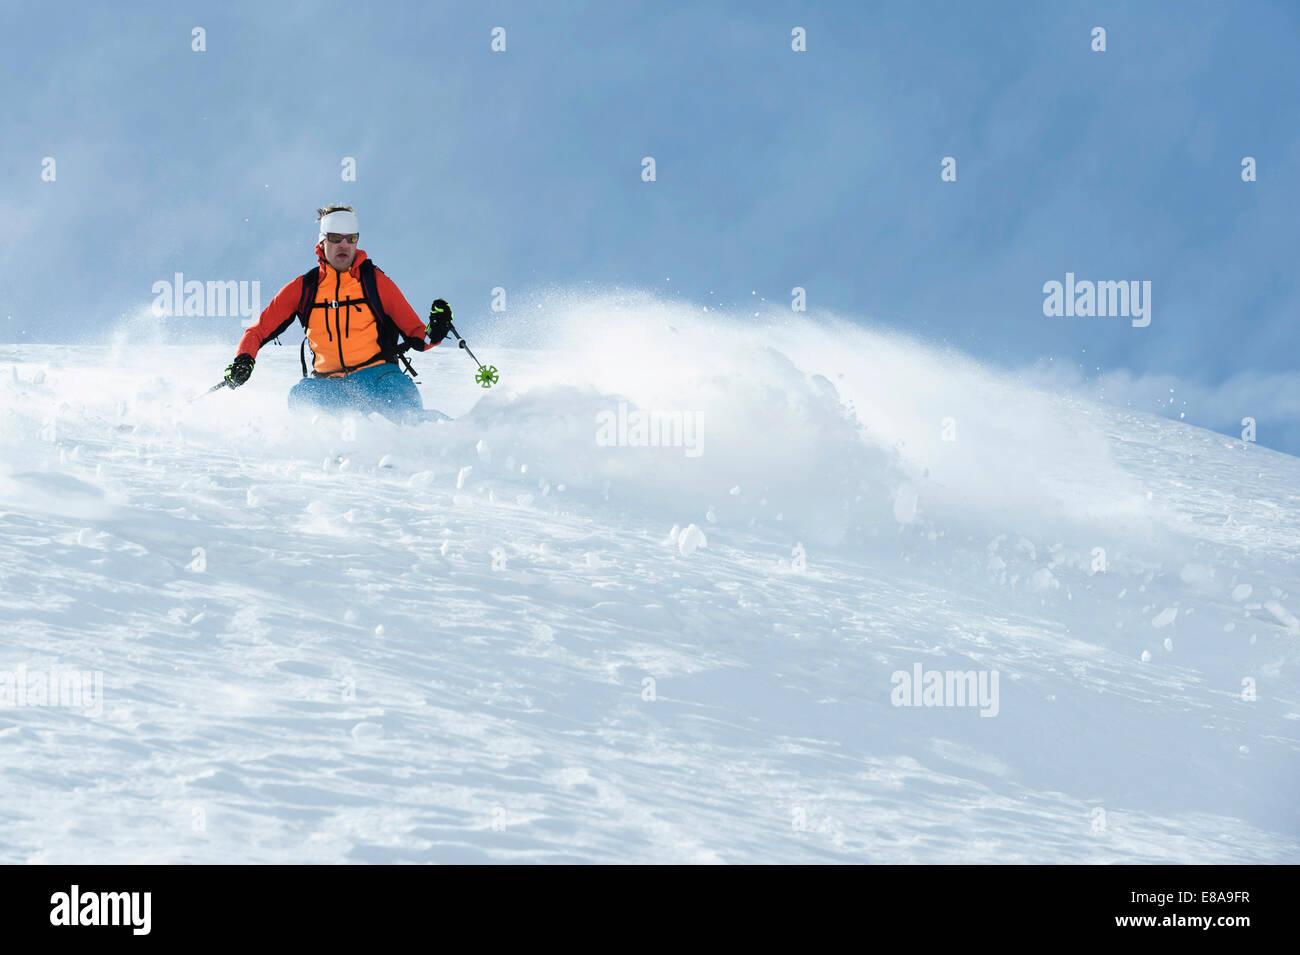 Man skiing downhill deep powder snow Alps - Stock Image